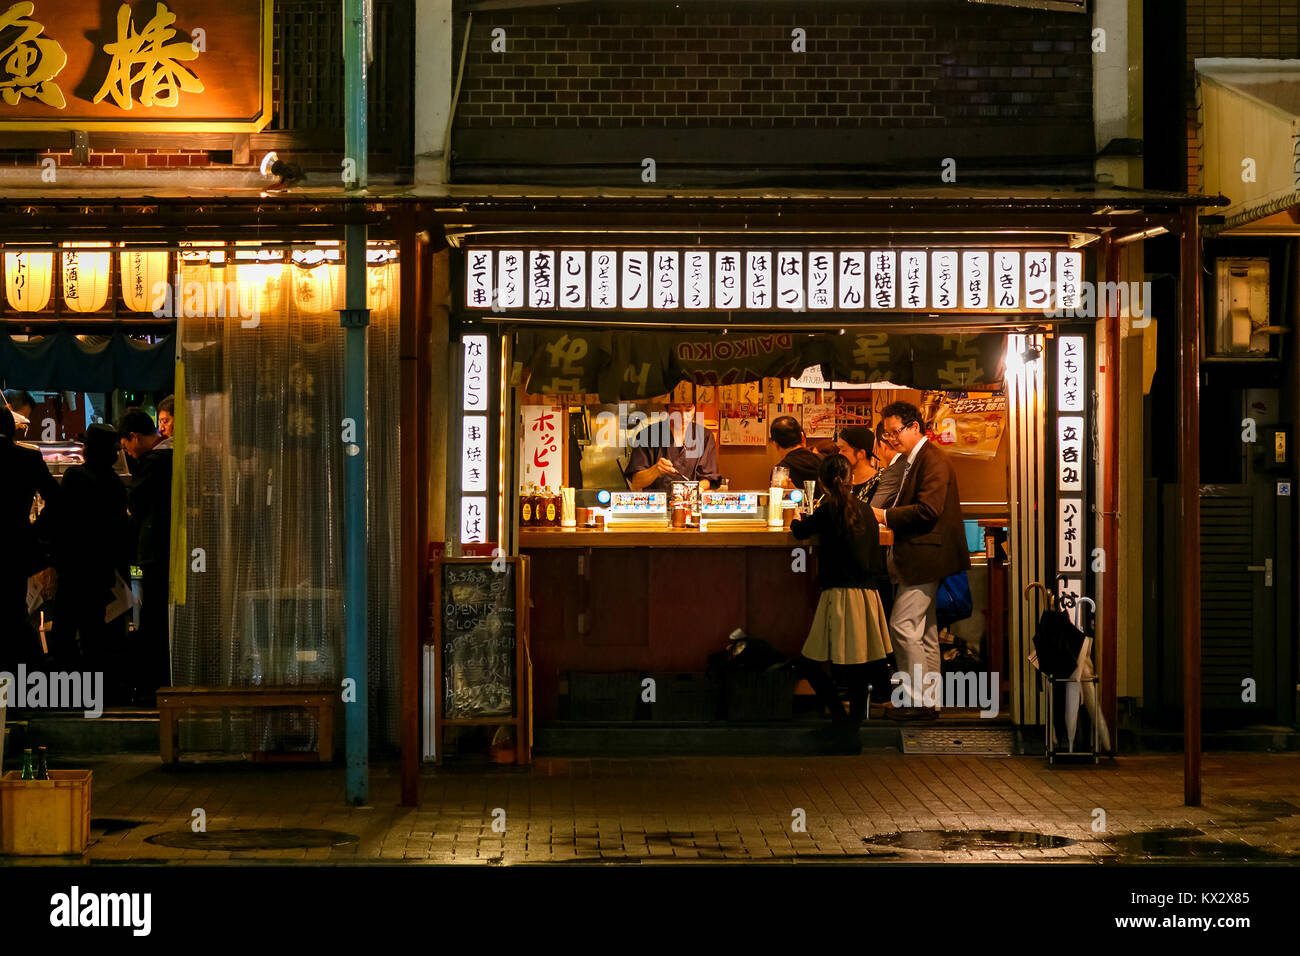 NAGOYA, JAPAN - NOVEMBER 18, 2015: NIghtlife of Japanese restaurants on the side of a street in Ngoya city Stock Photo